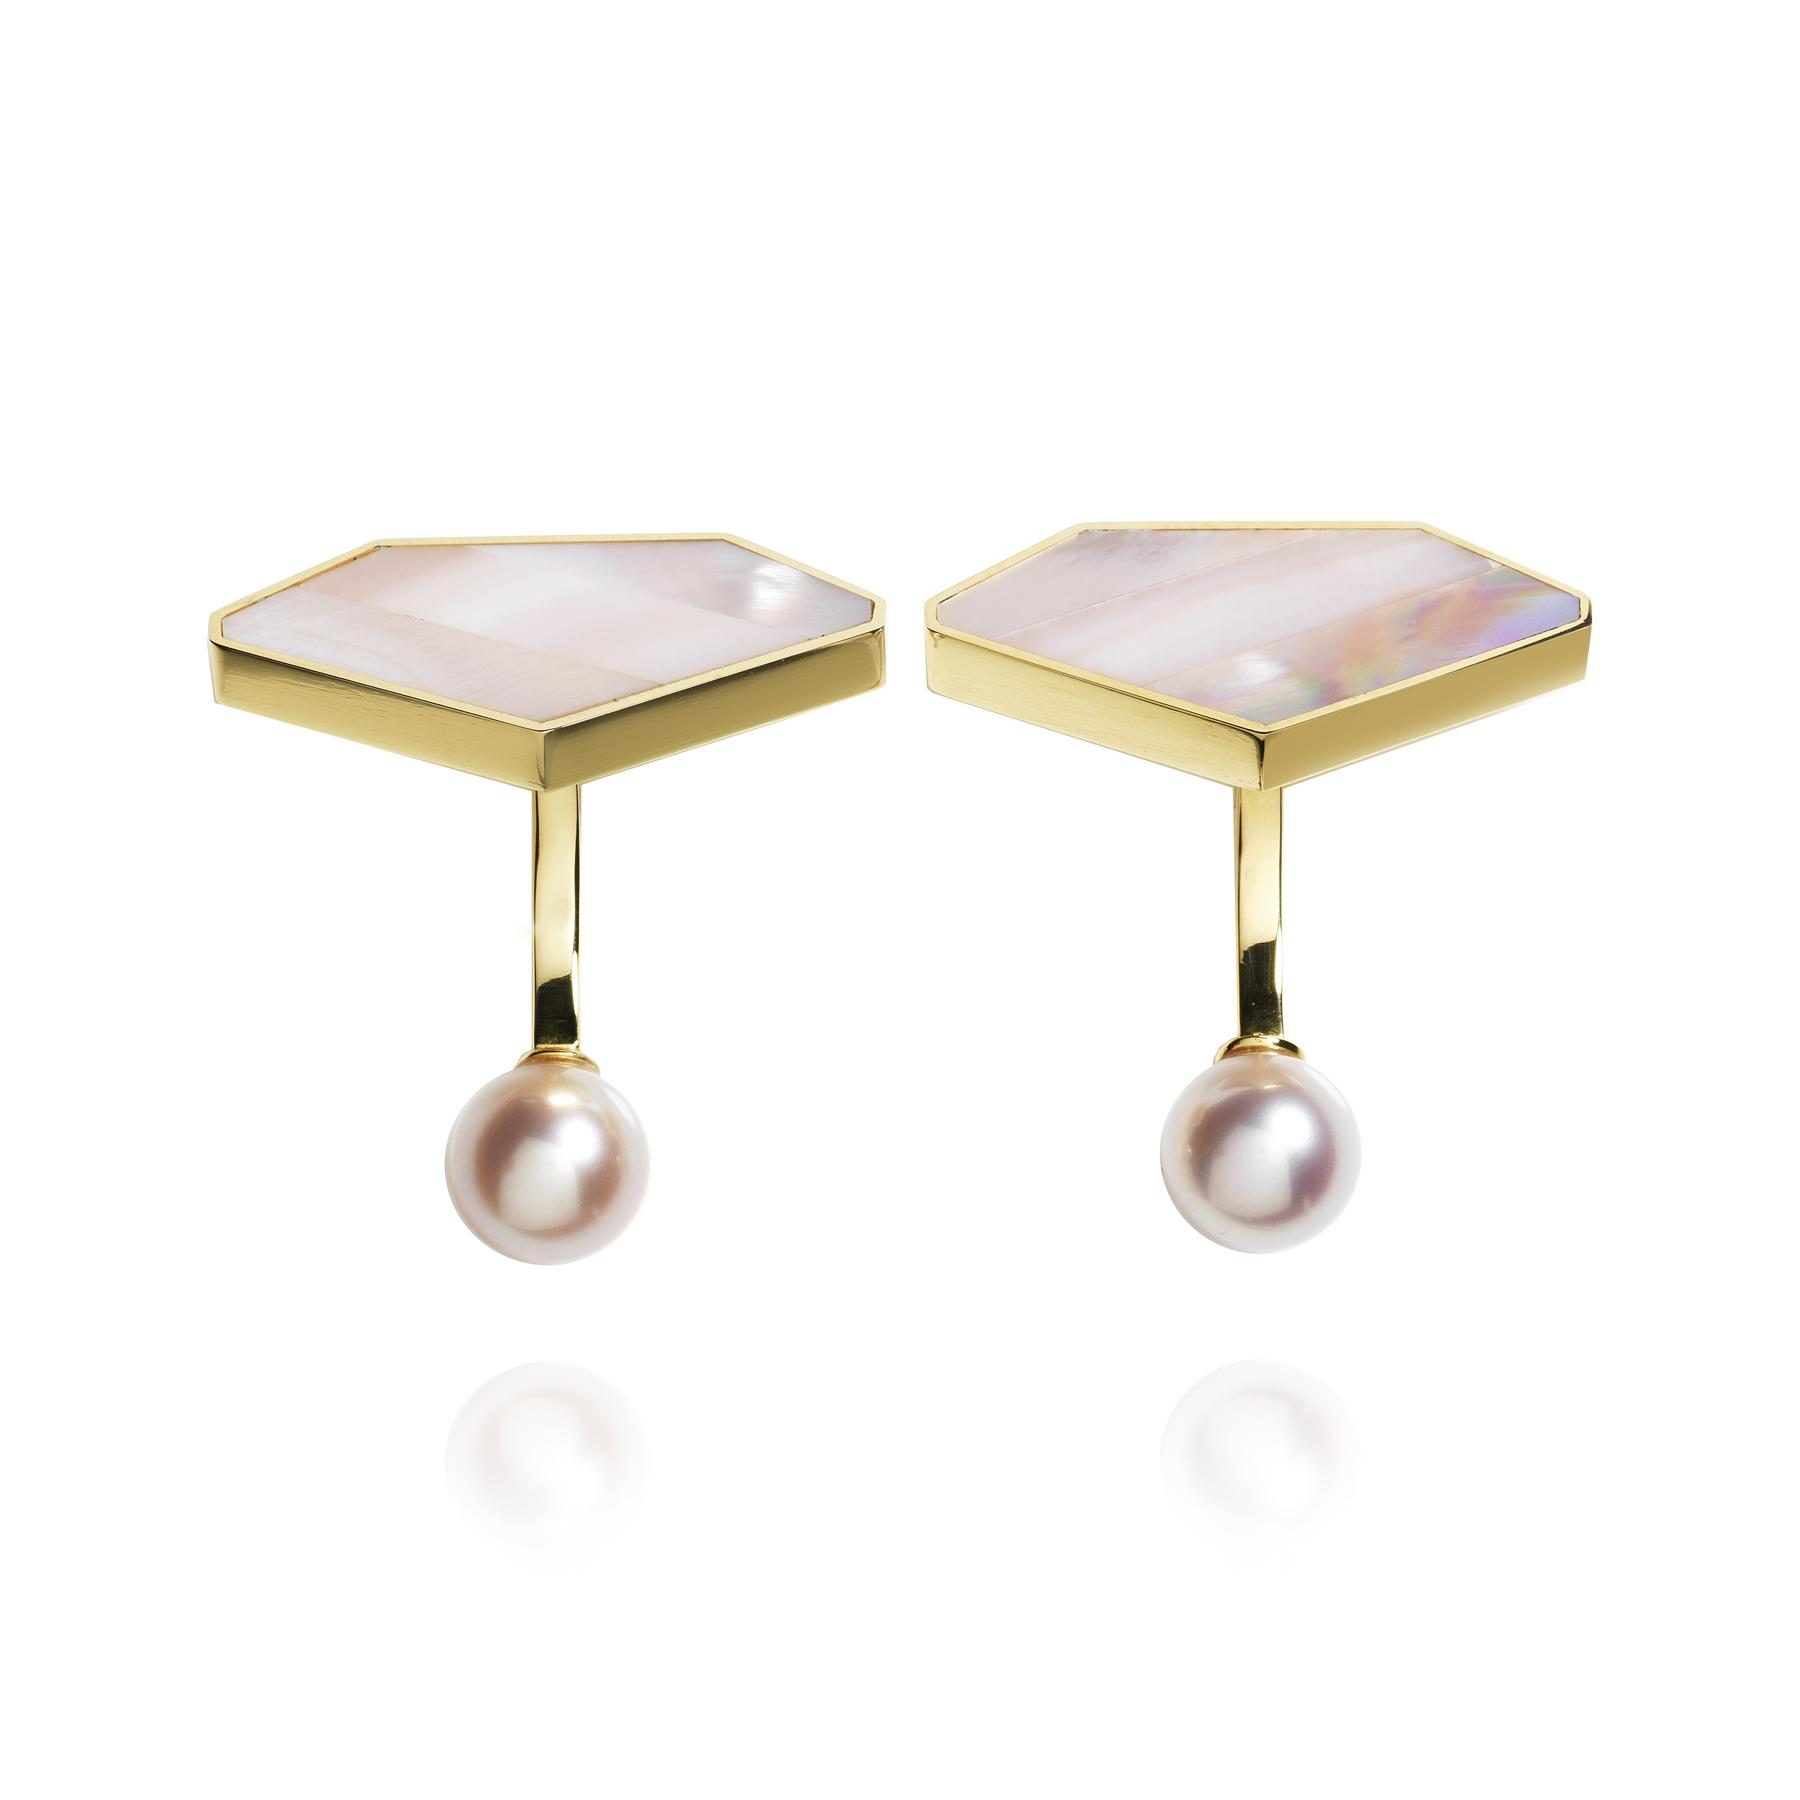 Gemstones MOP Emerald Cufflinks (Image Courtesy of Melanie Georgacopoulos)